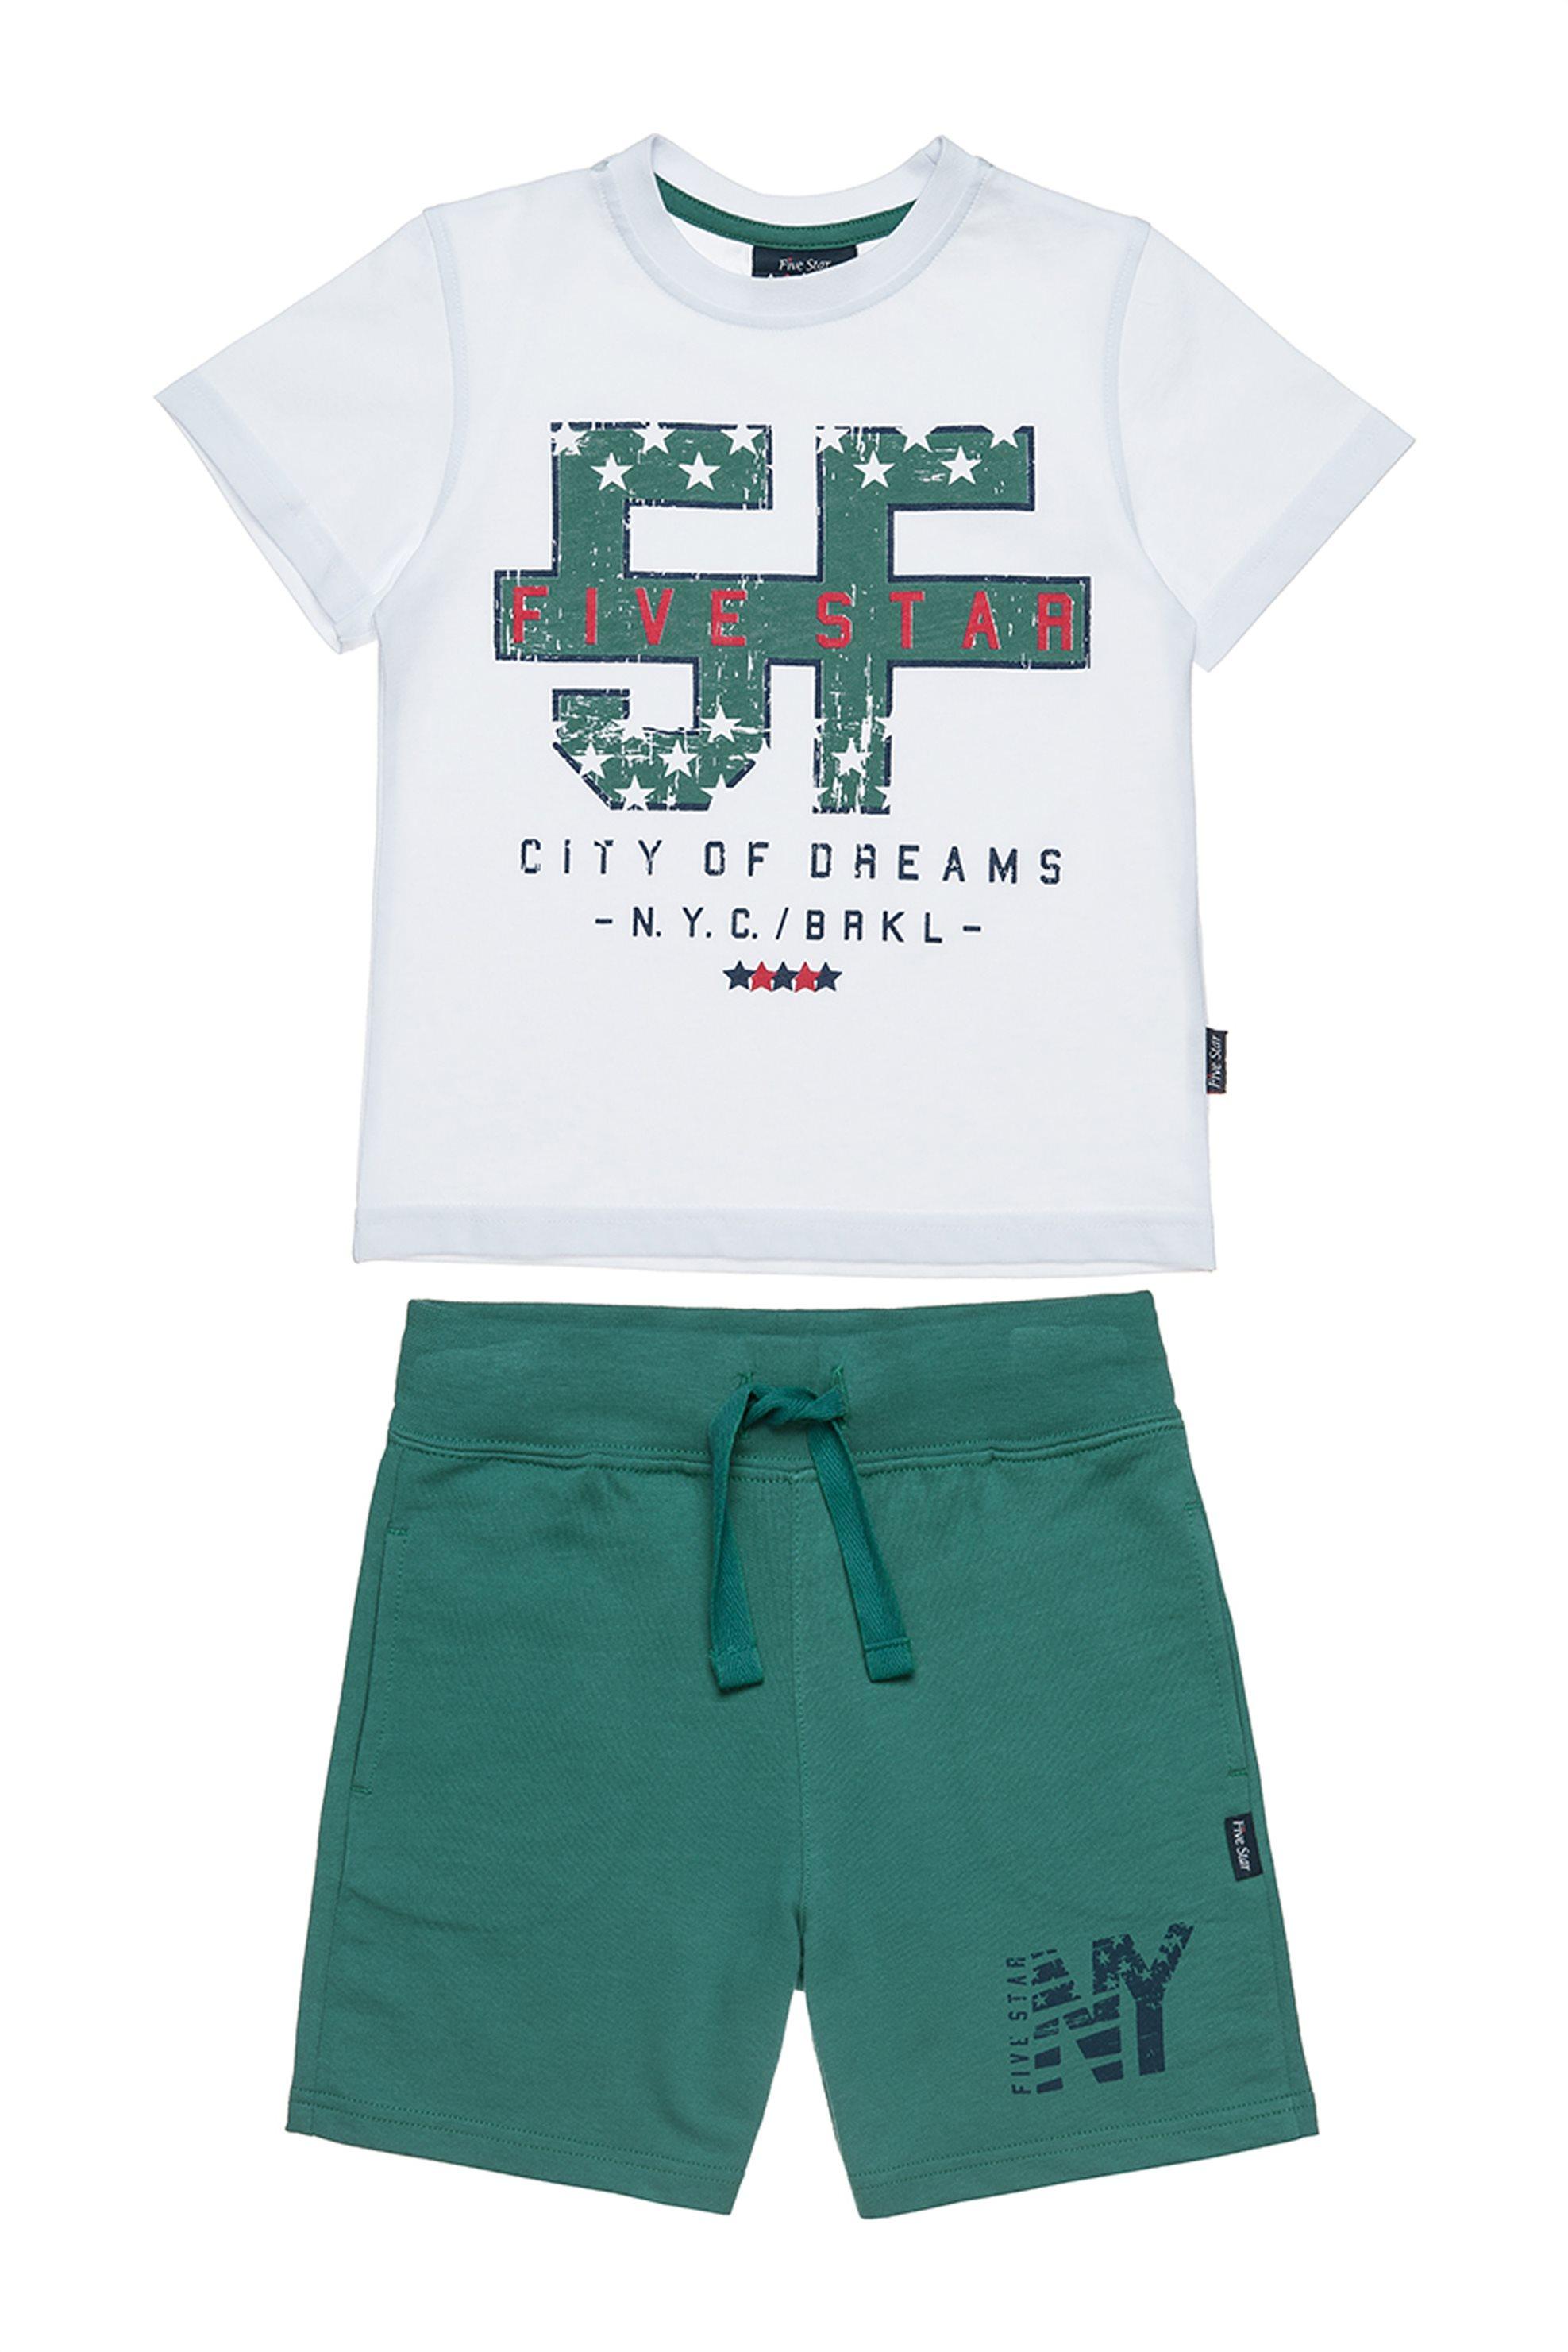 ac3b7b7f07 Αlouette παιδικό σετ μπλούζα με τύπωμα και βερμούδα Five Star (9 μηνών-5  ετών